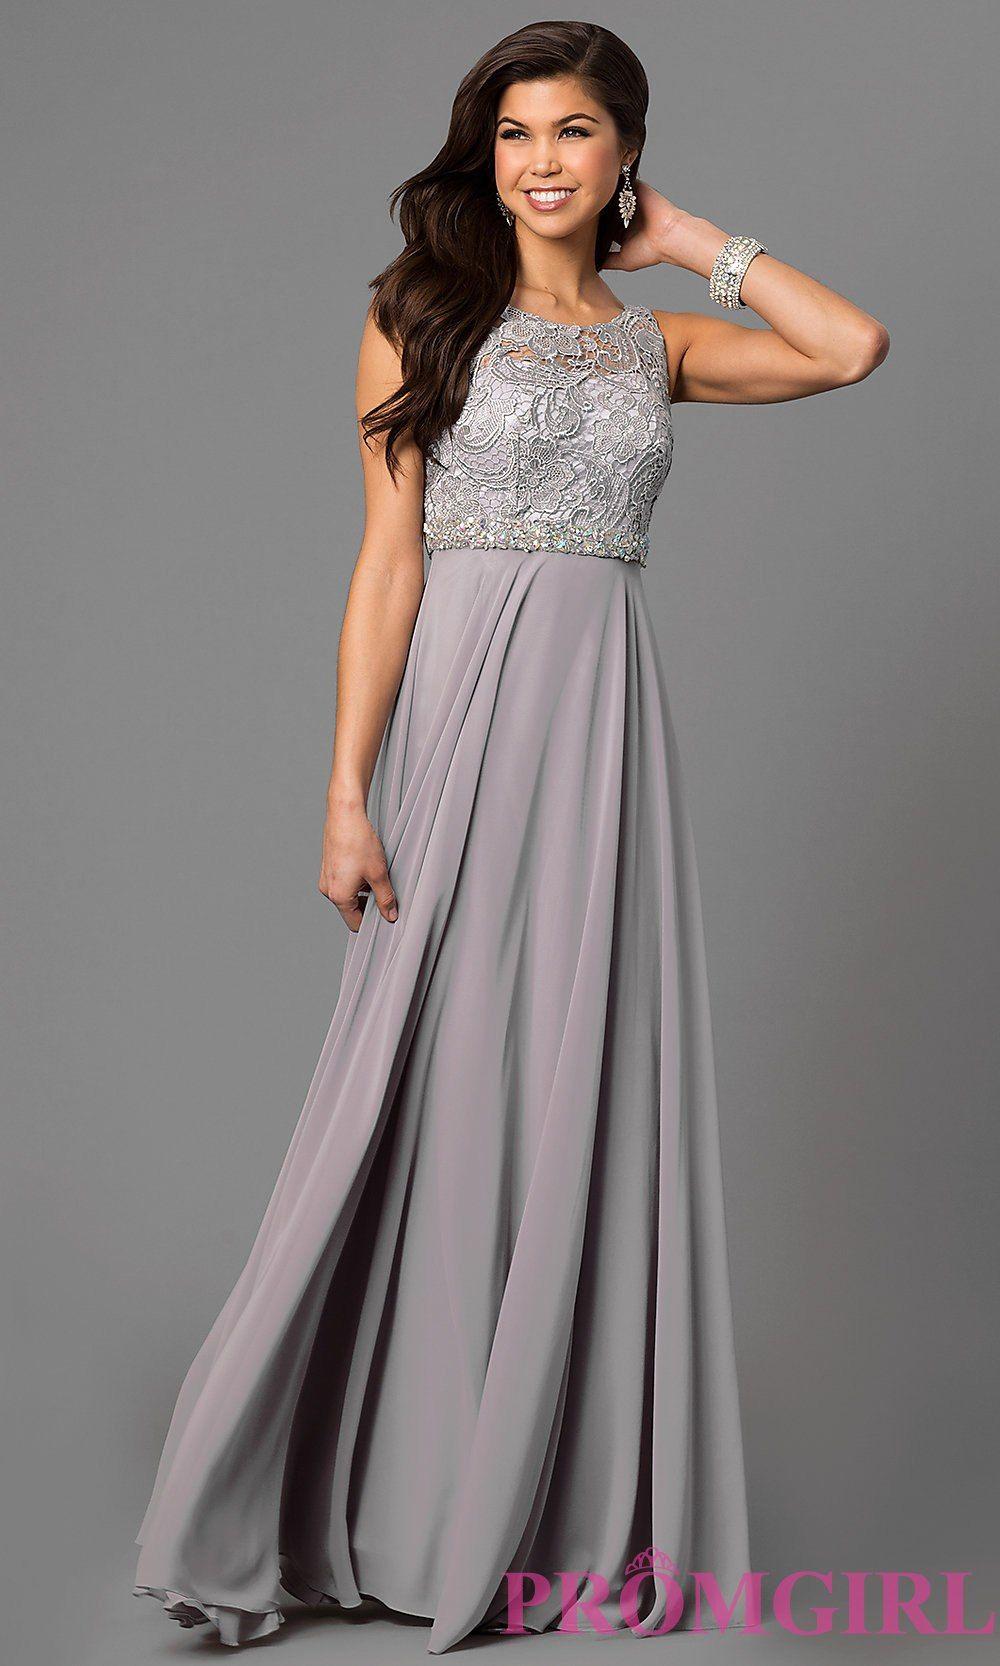 Long lacedbodice chiffon prom dresspromgirl katieus special day